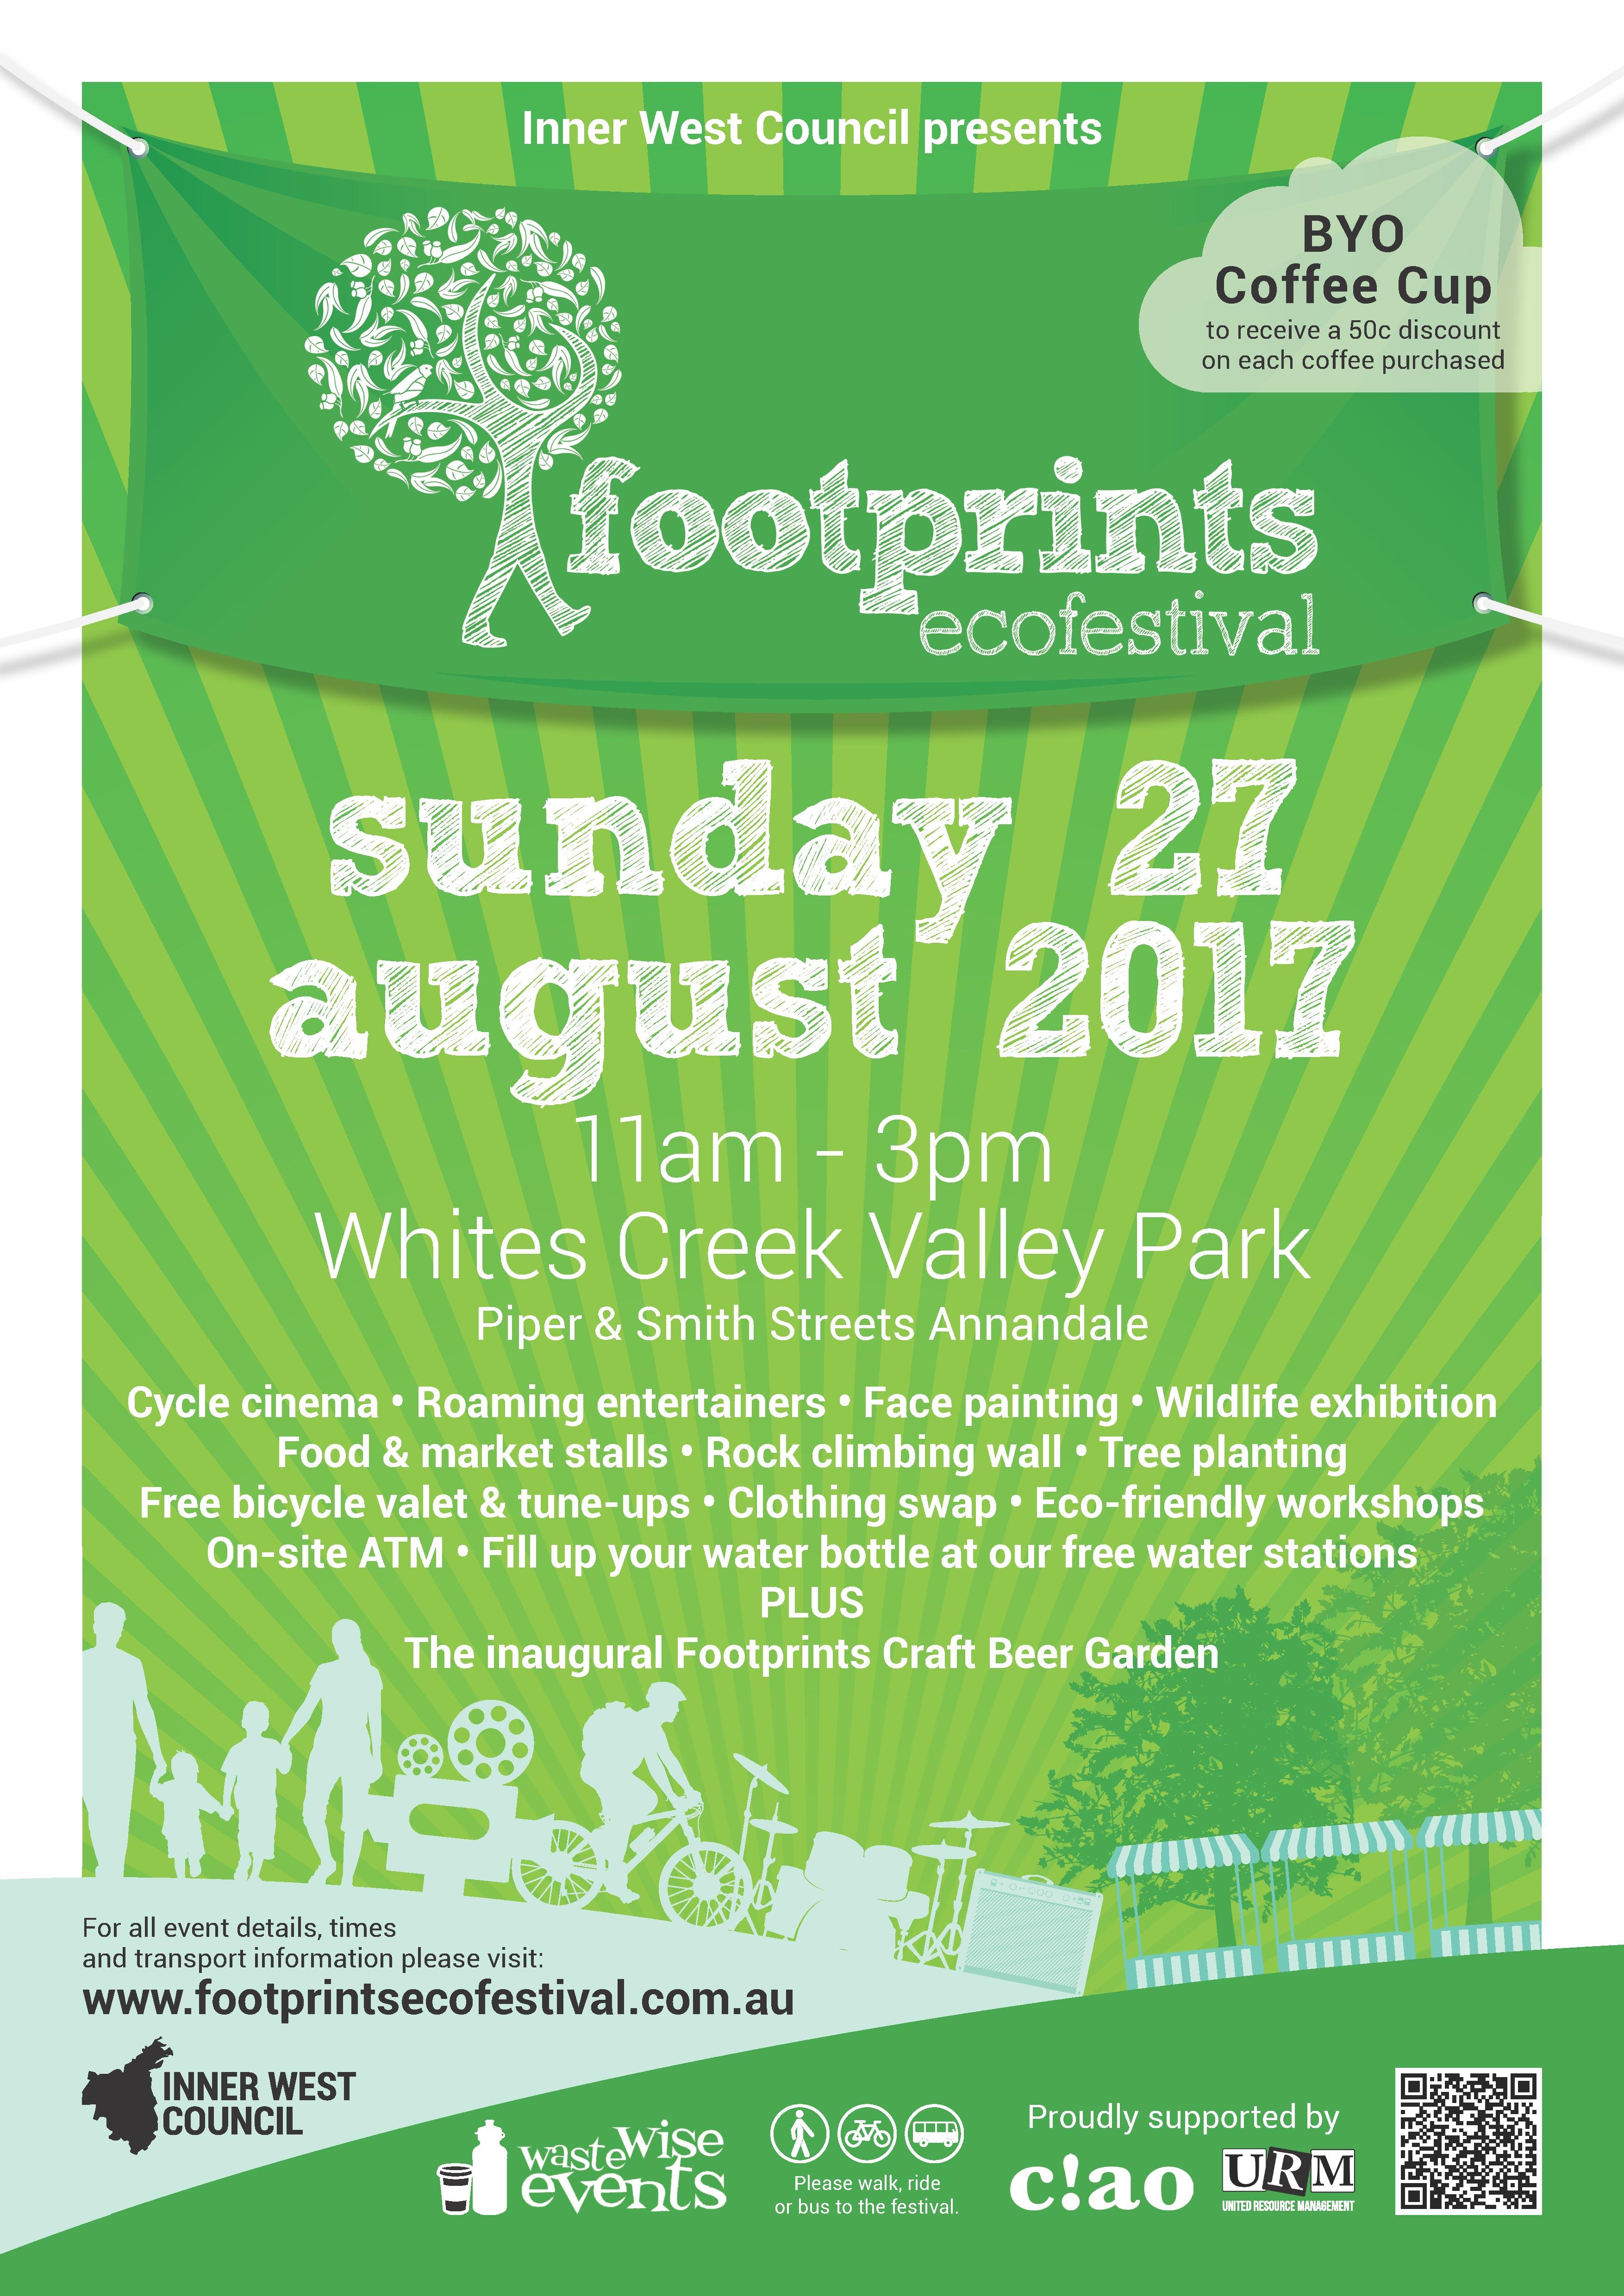 Iwc 2017 Footprints Festival A3 Poster